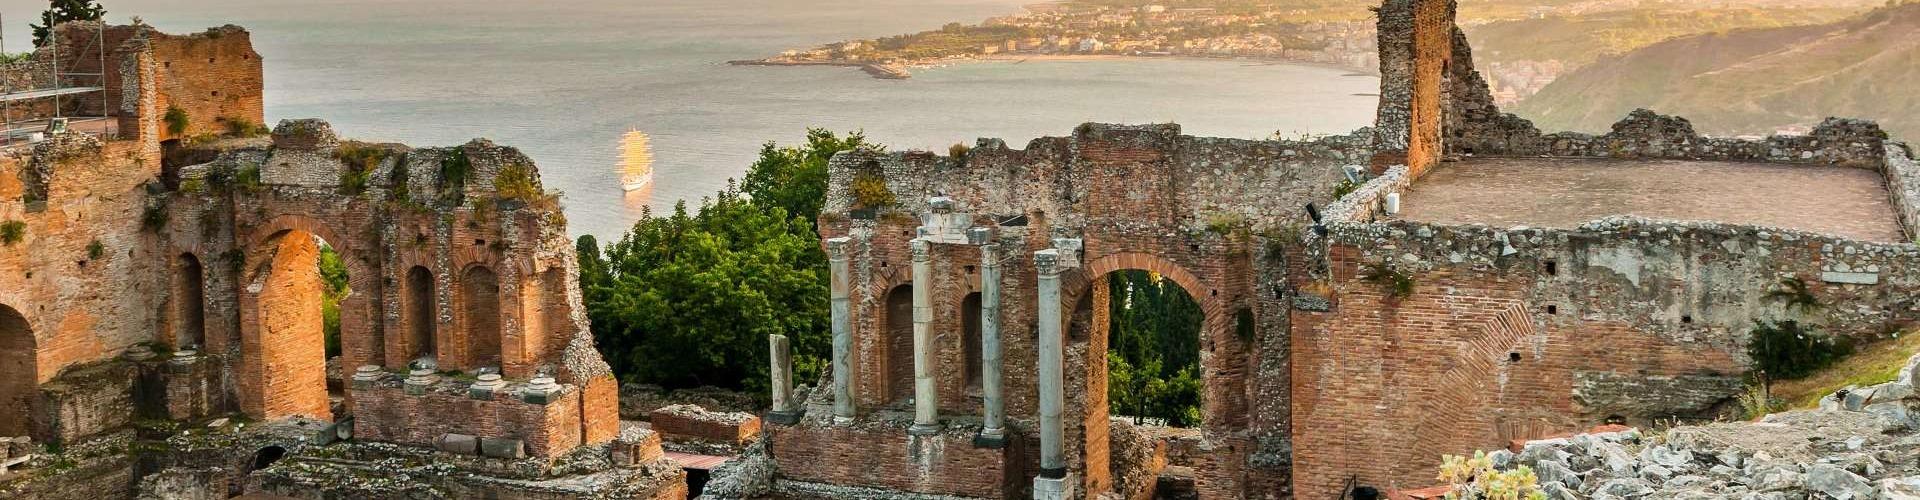 Z Majorki na Korfu 2